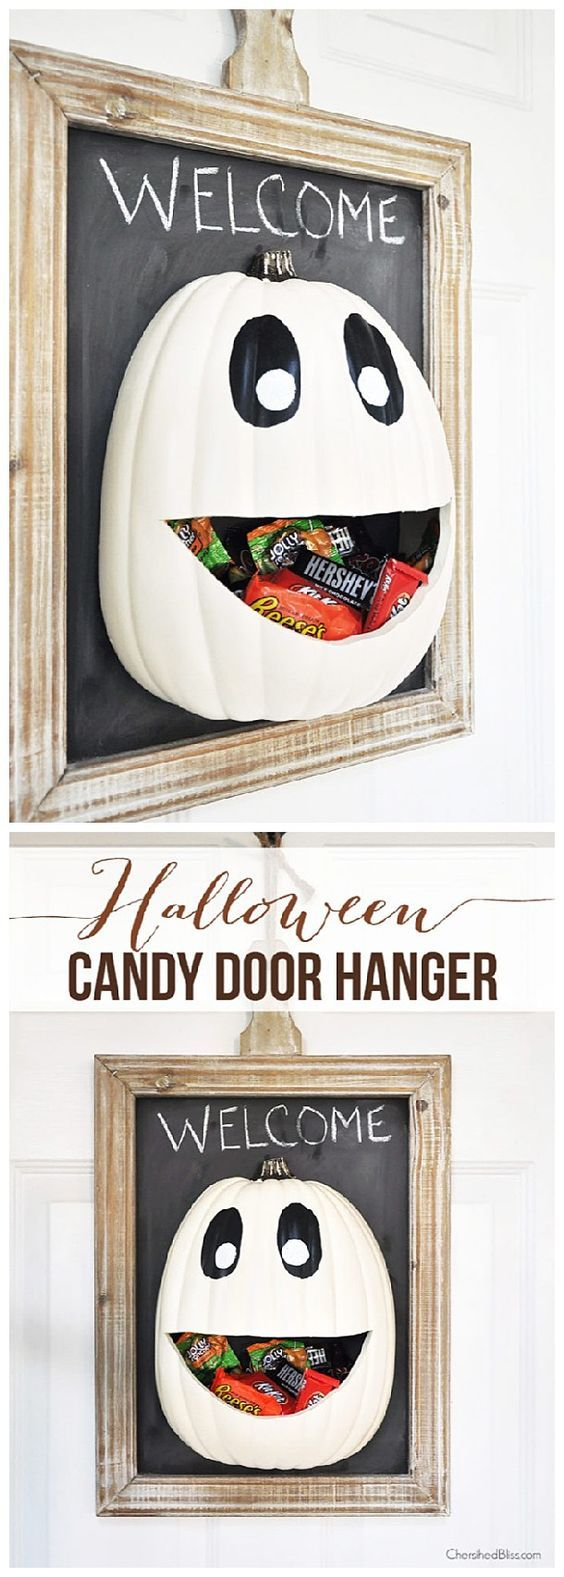 Best 25+ Pumpkin people ideas only on Pinterest | Thanksgiving ...